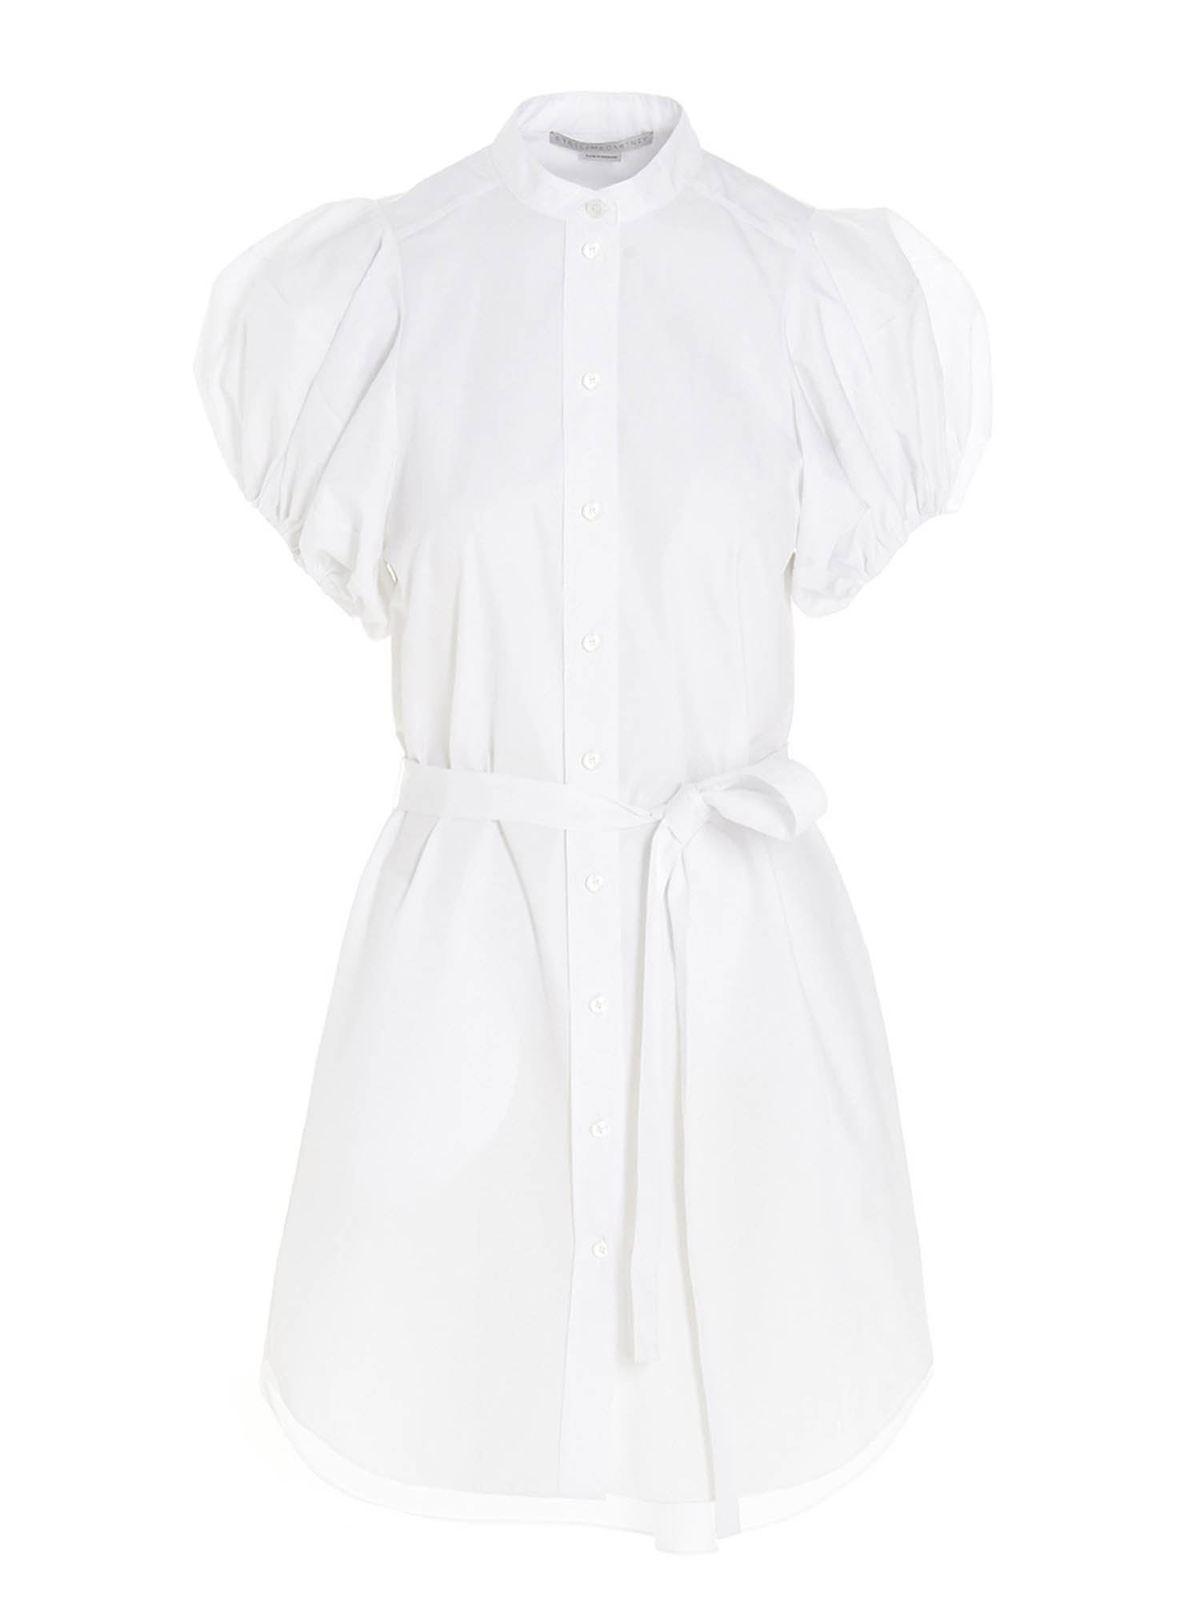 Stella Mccartney Cottons ANASTASIA SHIRT DRESS IN WHITE